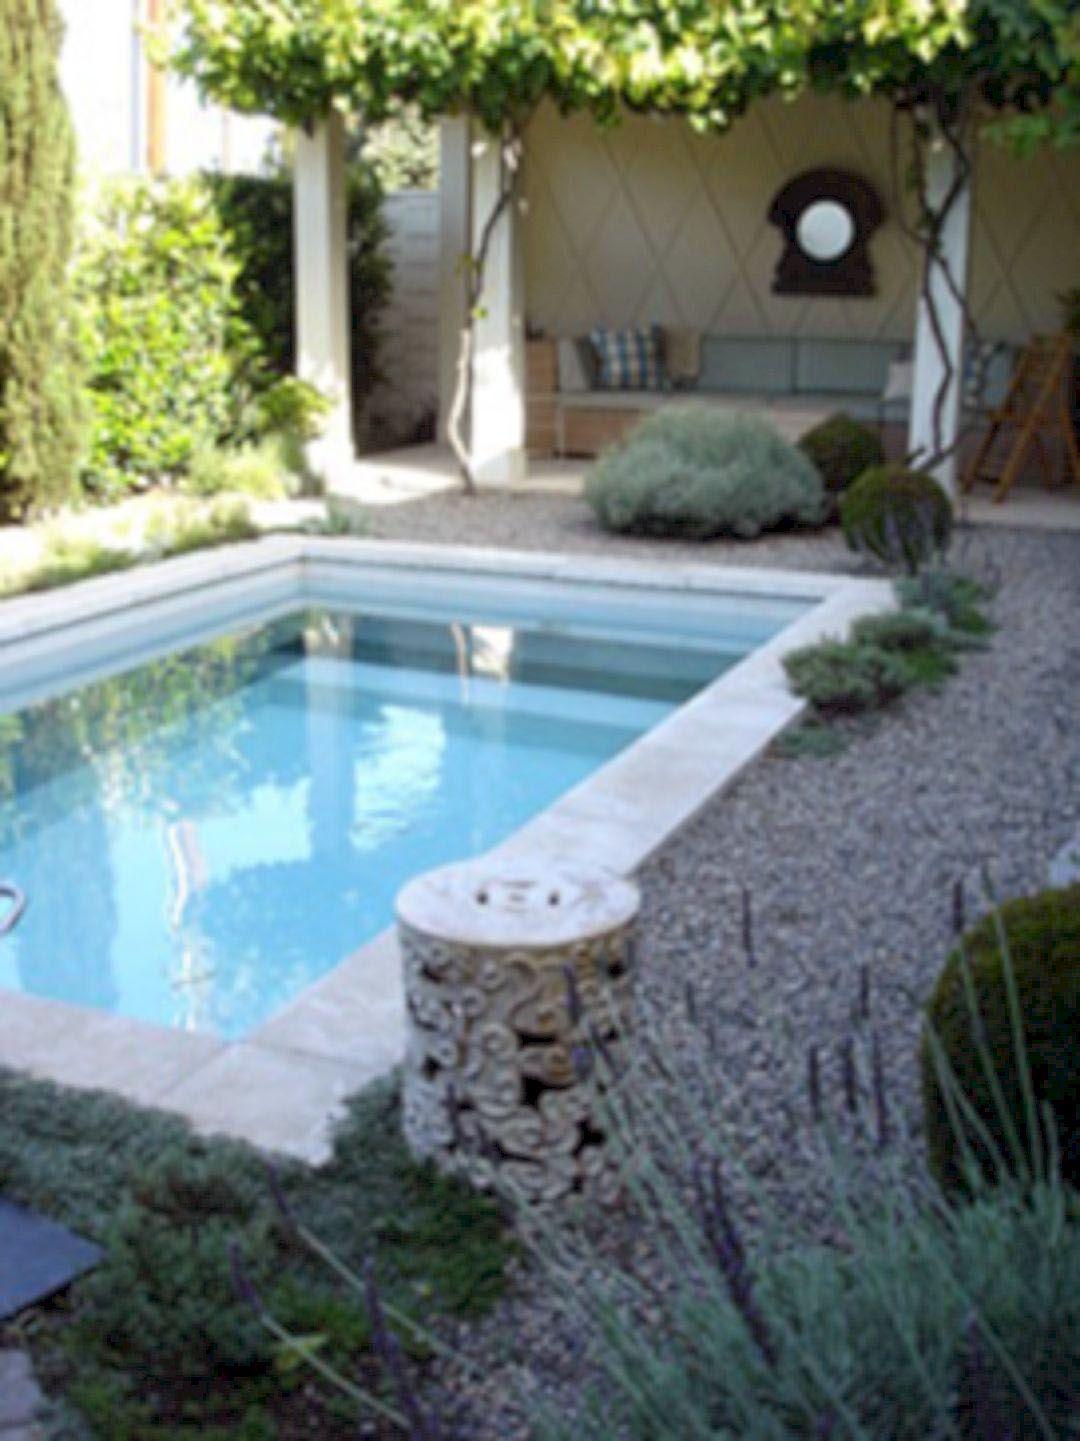 14 Amazing Backyard Pool Ideas Backyard Pool Endless Pool Small Pools